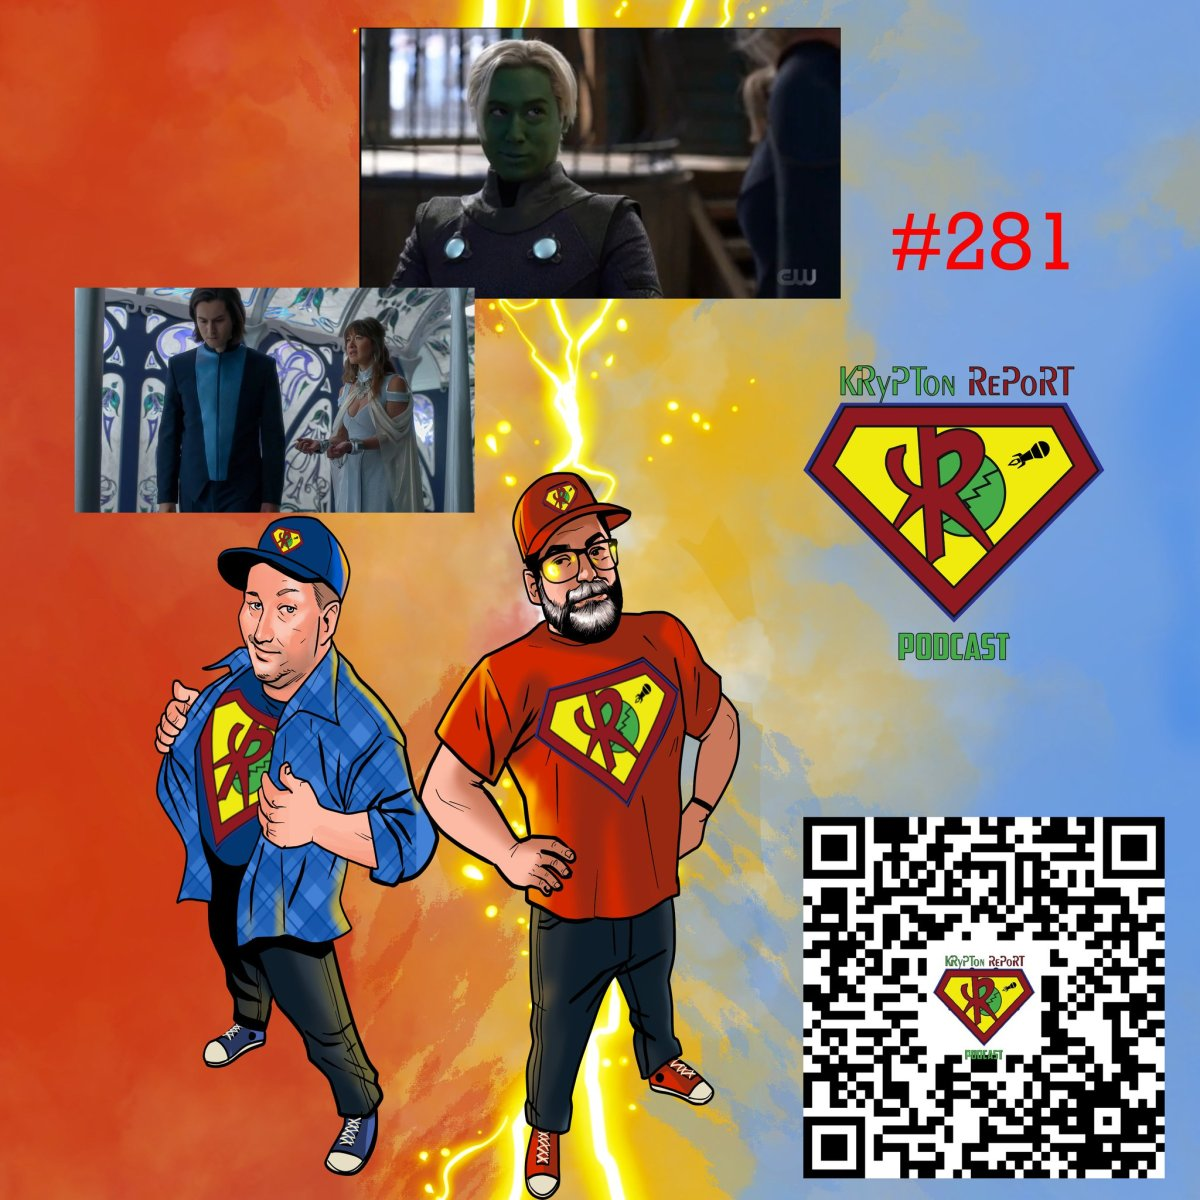 Krypton Report